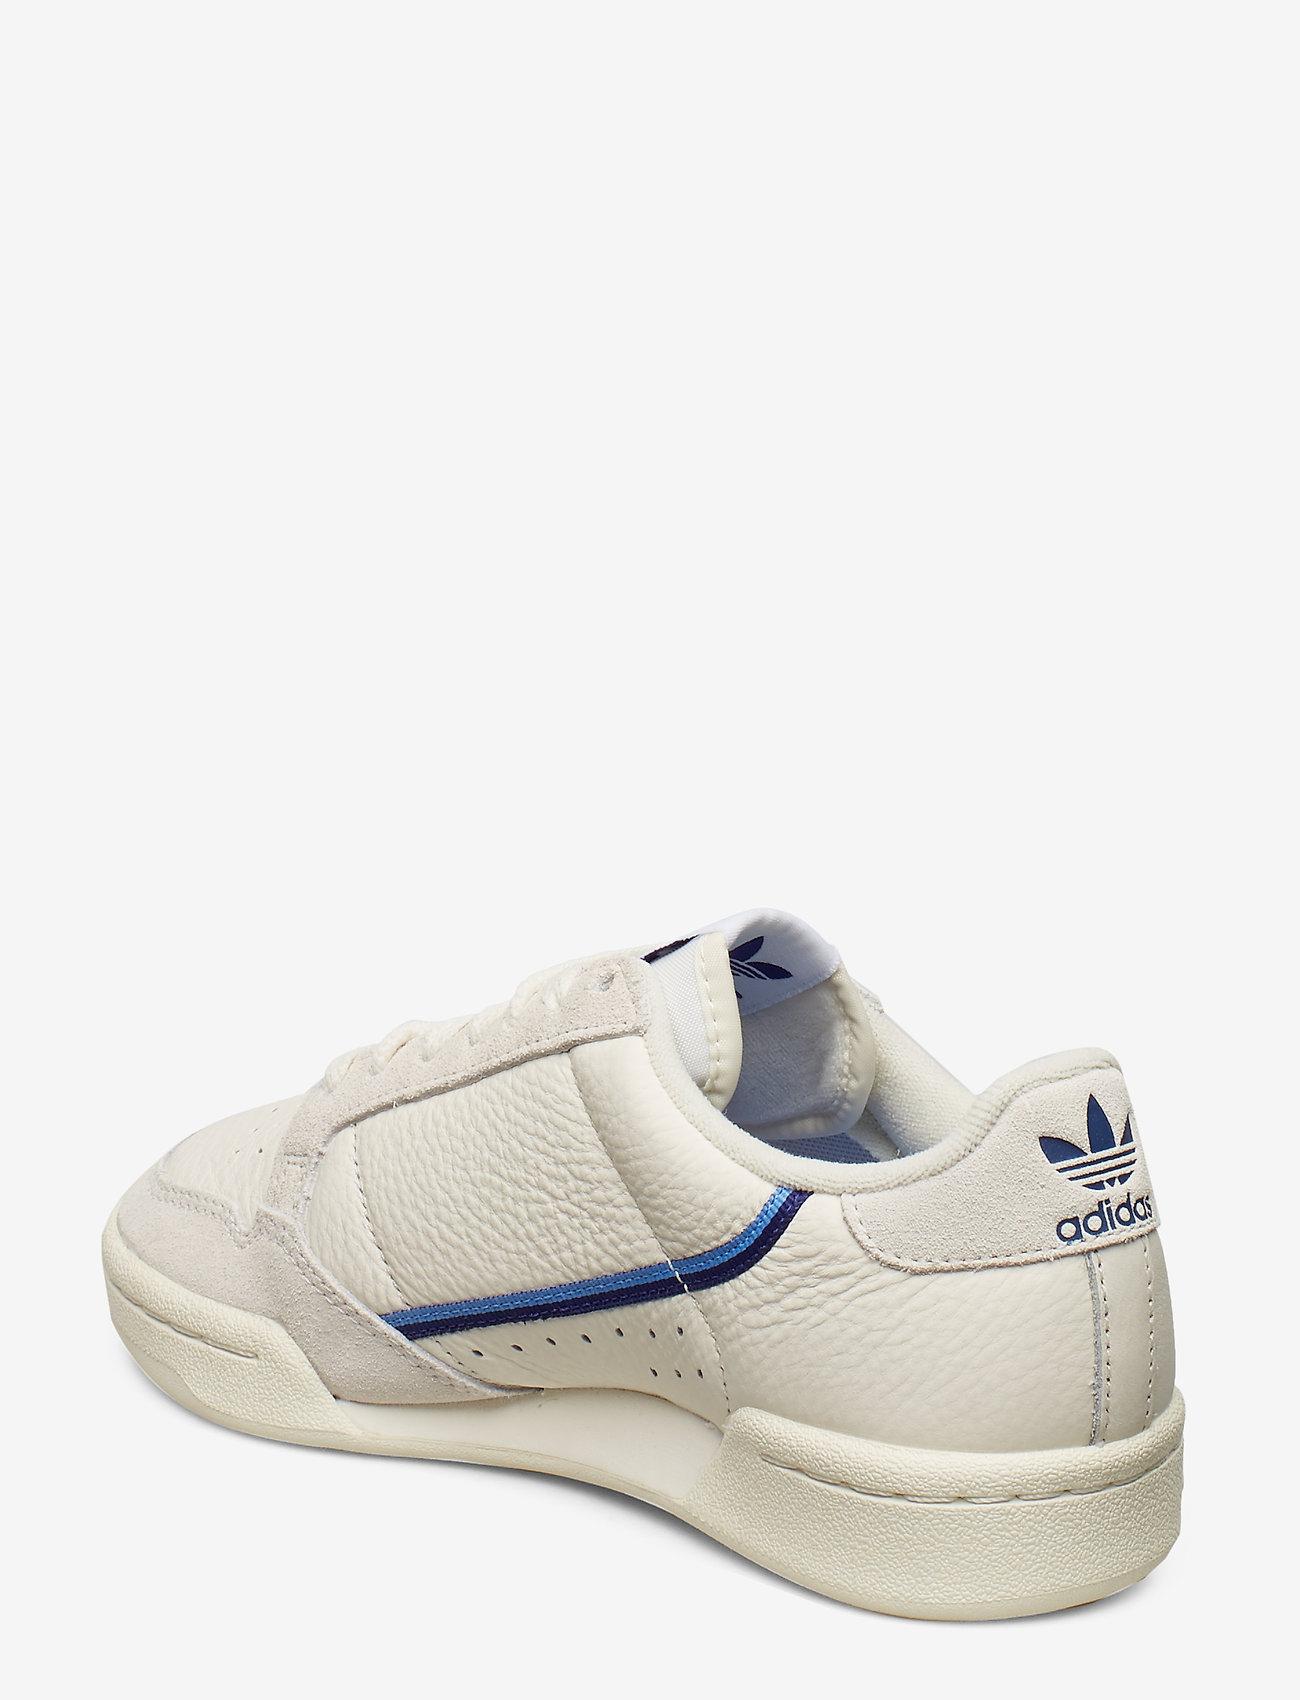 Continental 80 W (Owhite/clowhi/rawwht) - adidas Originals